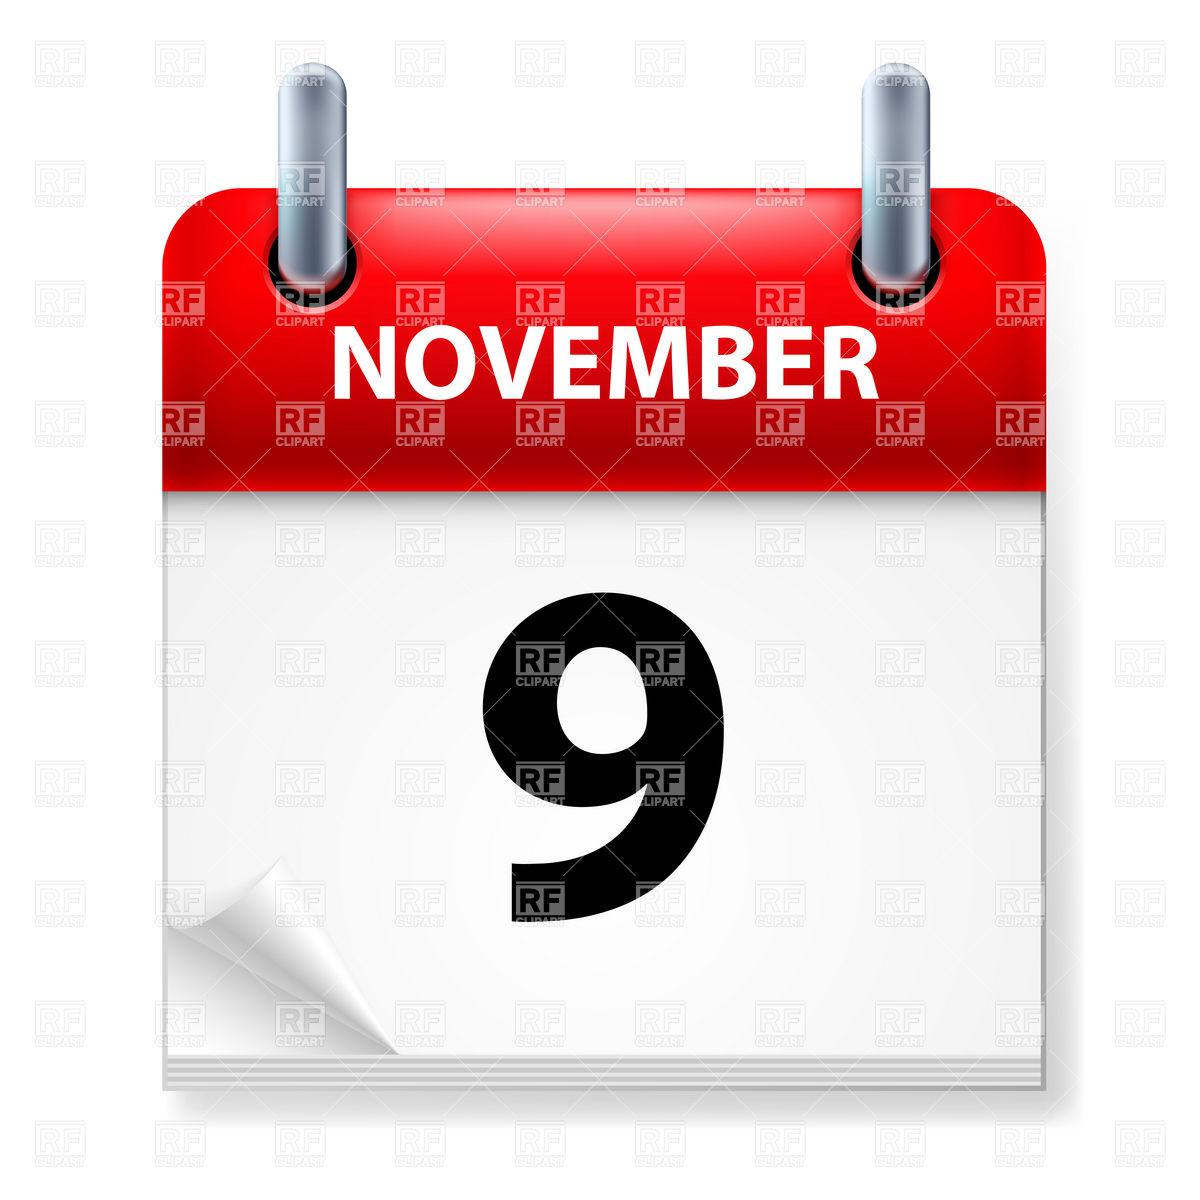 November 9th calendar clipart svg free November 9th calendar clipart - ClipartFest svg free